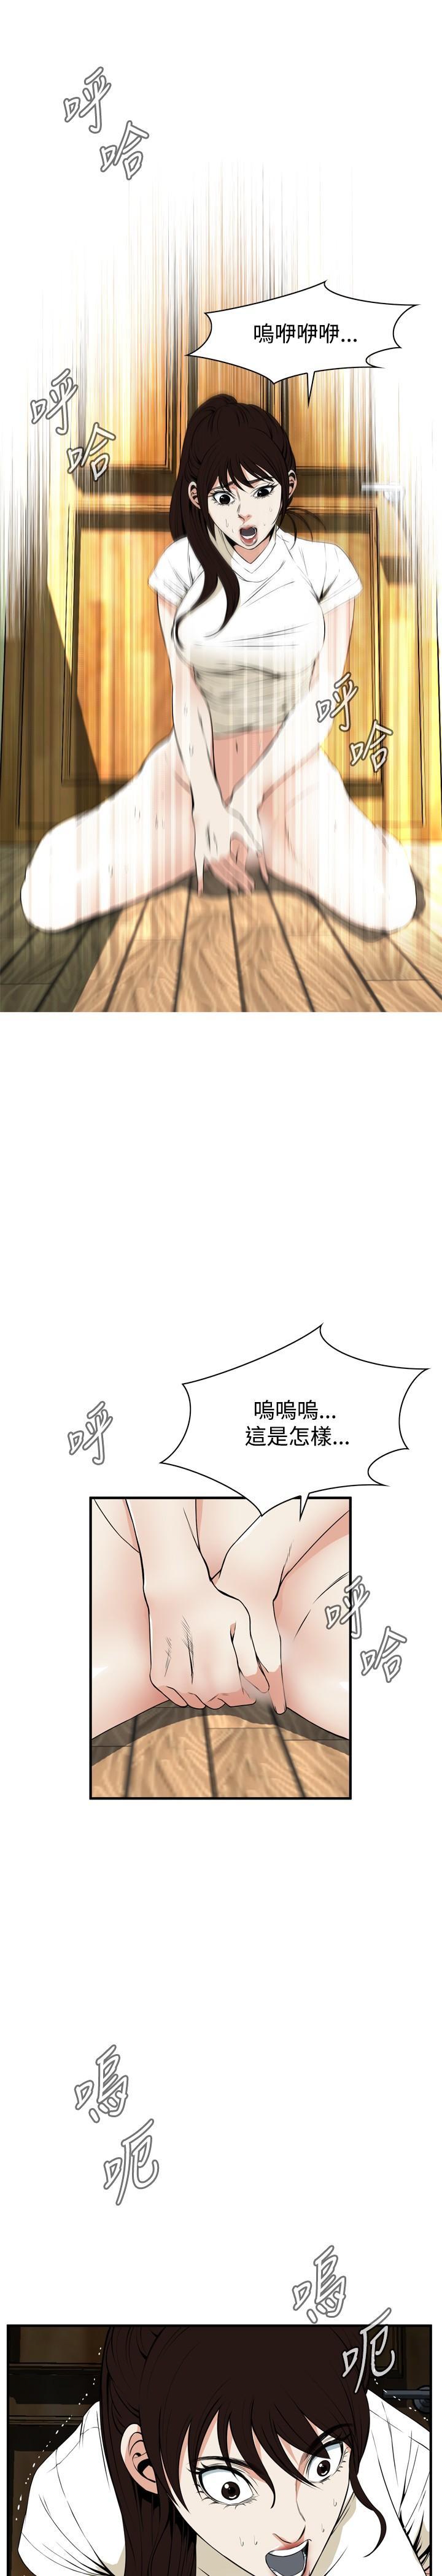 Take a Peek 偷窥 Ch.39~55 [Chinese]中文 16